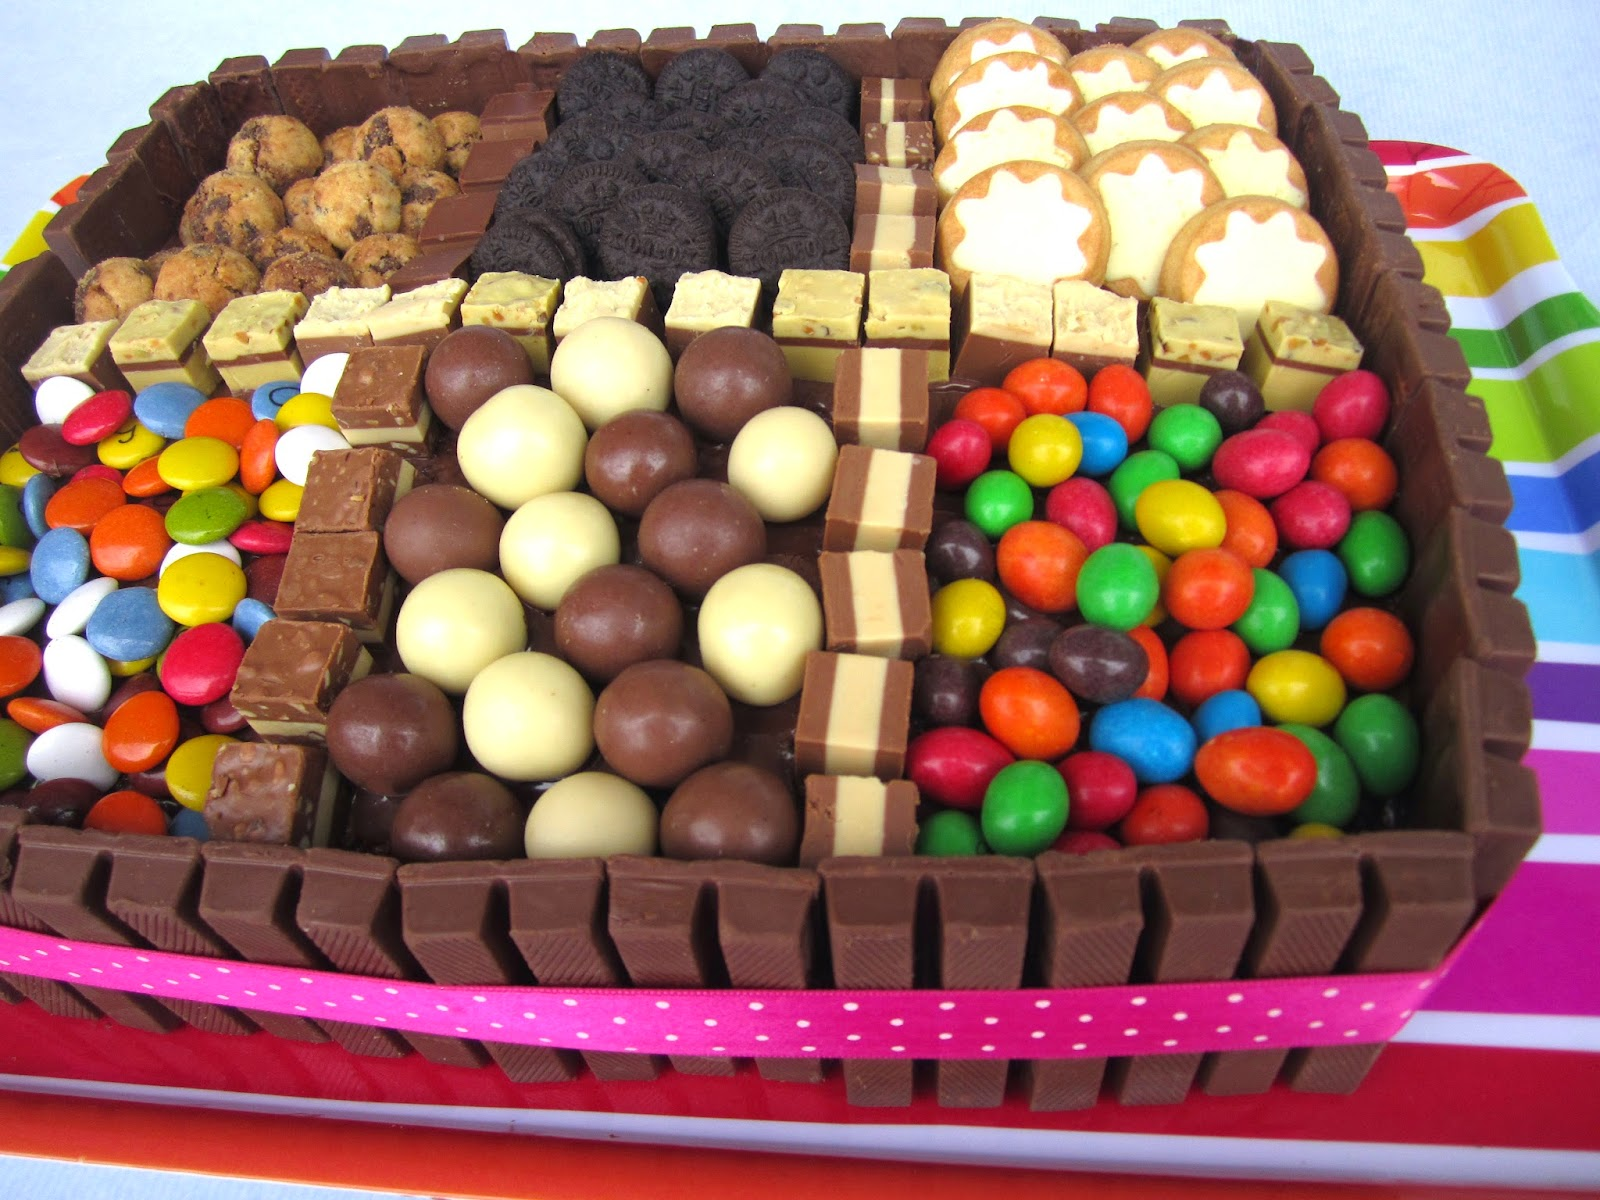 Mardefiesta tarta surtido de chocolates - Como hacer figuras con chuches ...